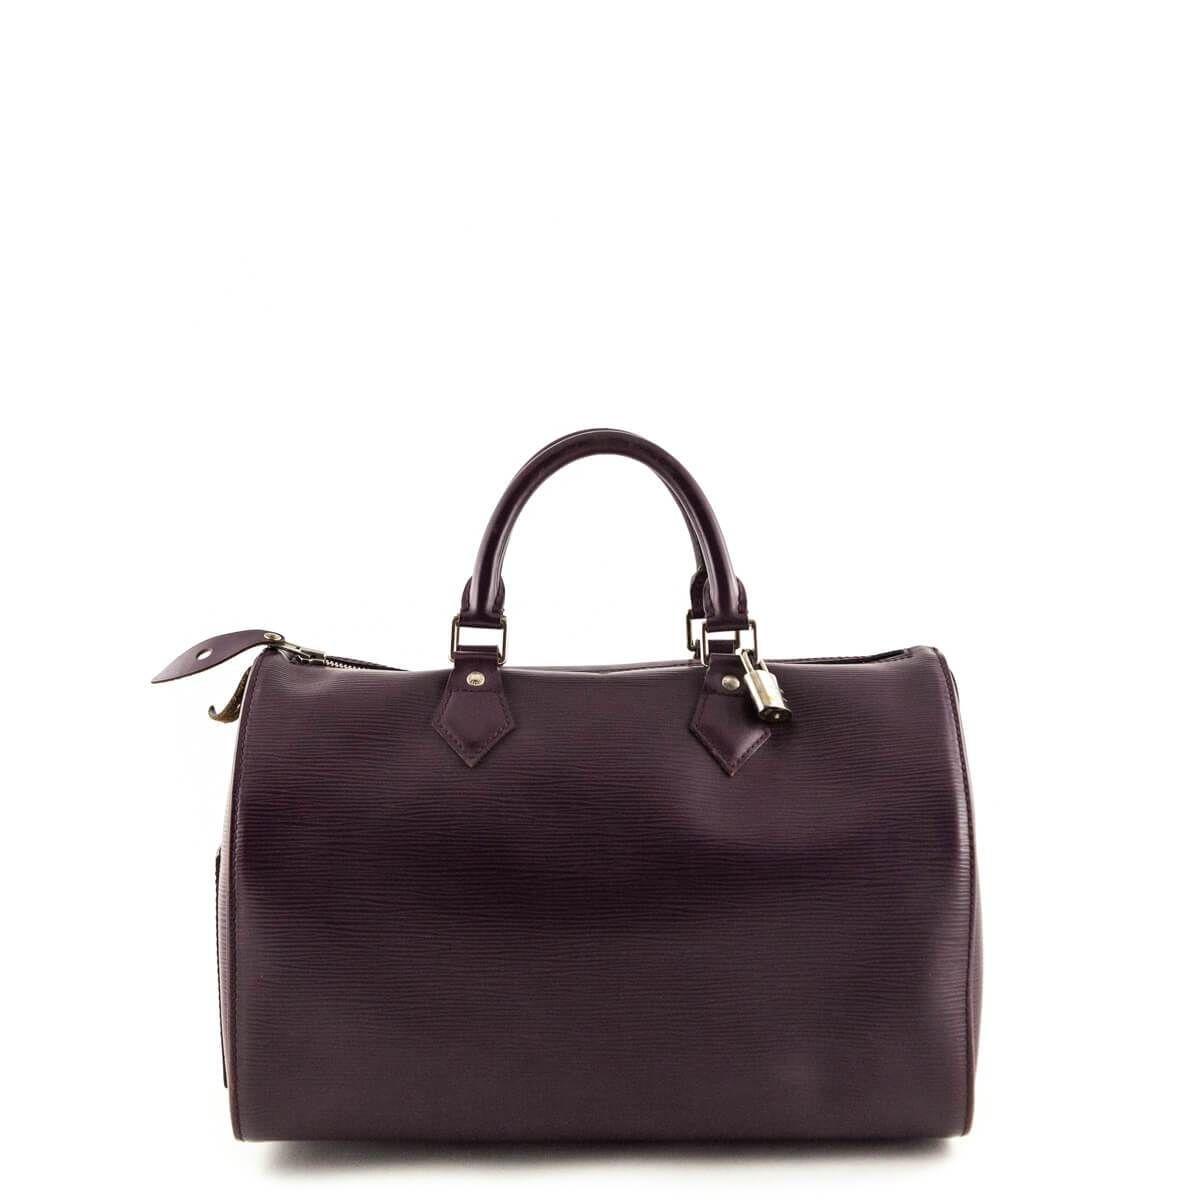 Louis Vuitton Plum Epi Speedy 35 - LOVE that BAG - Preowned Authentic  Designer Handbags - 24a625c50ab39